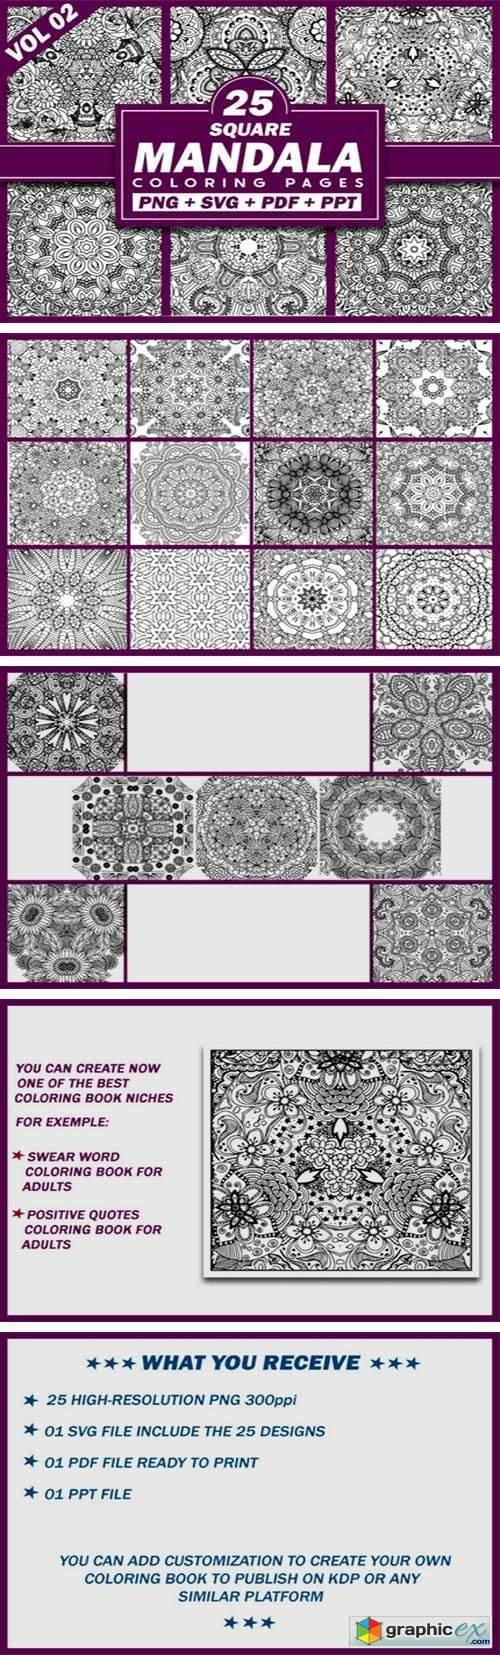 25 Square Mandala Coloring Pages | KDP